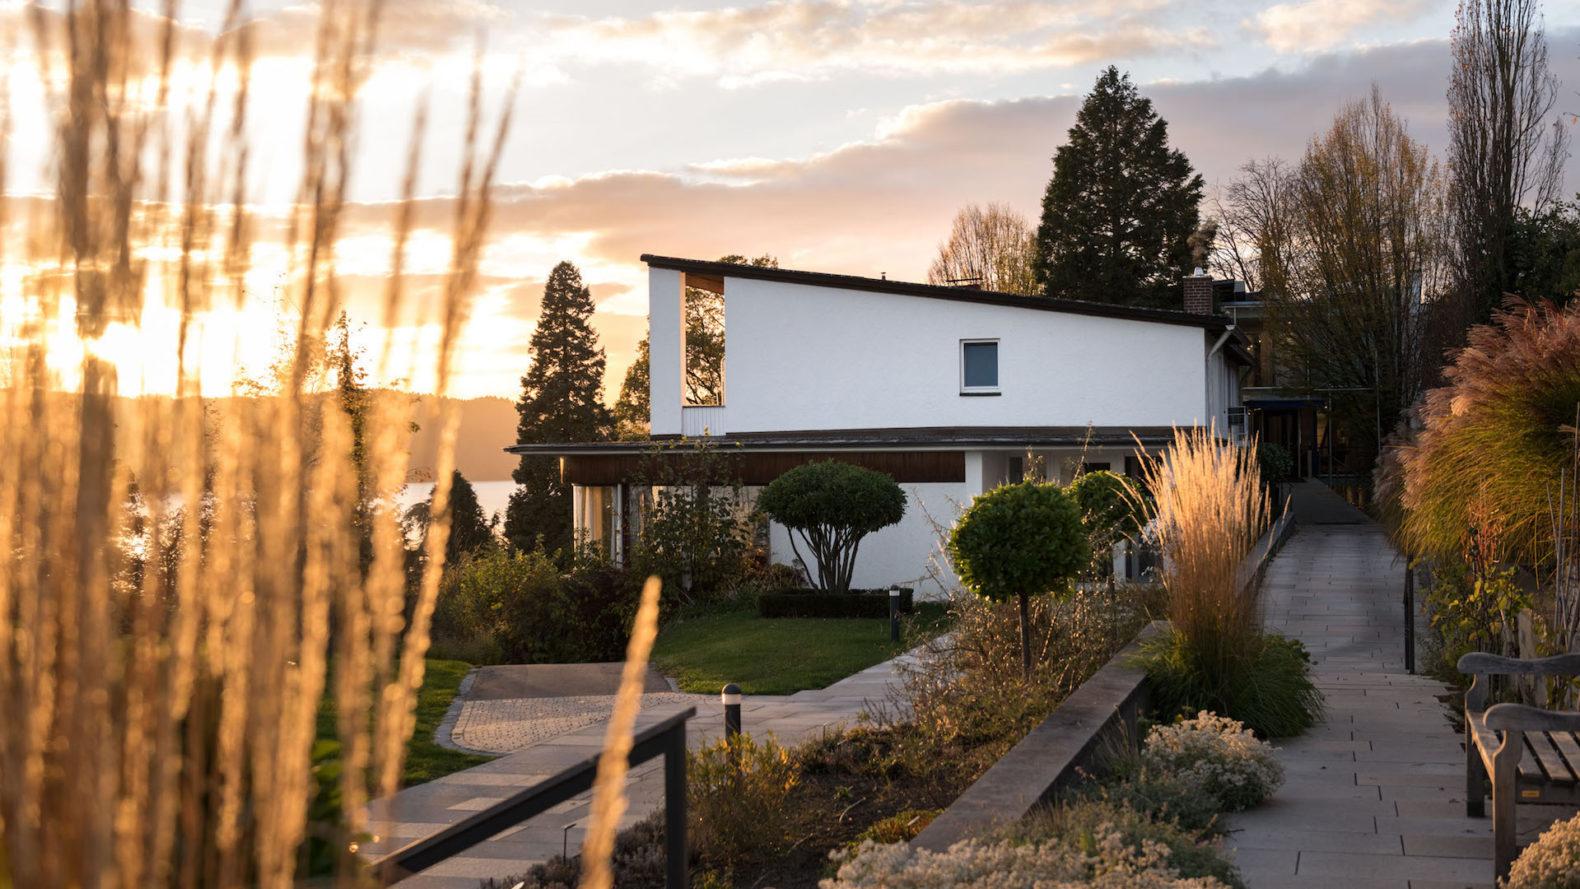 exterior-main-building-golden-hour-buchinger-wilhelmi-bodensee-lake-constance-germany